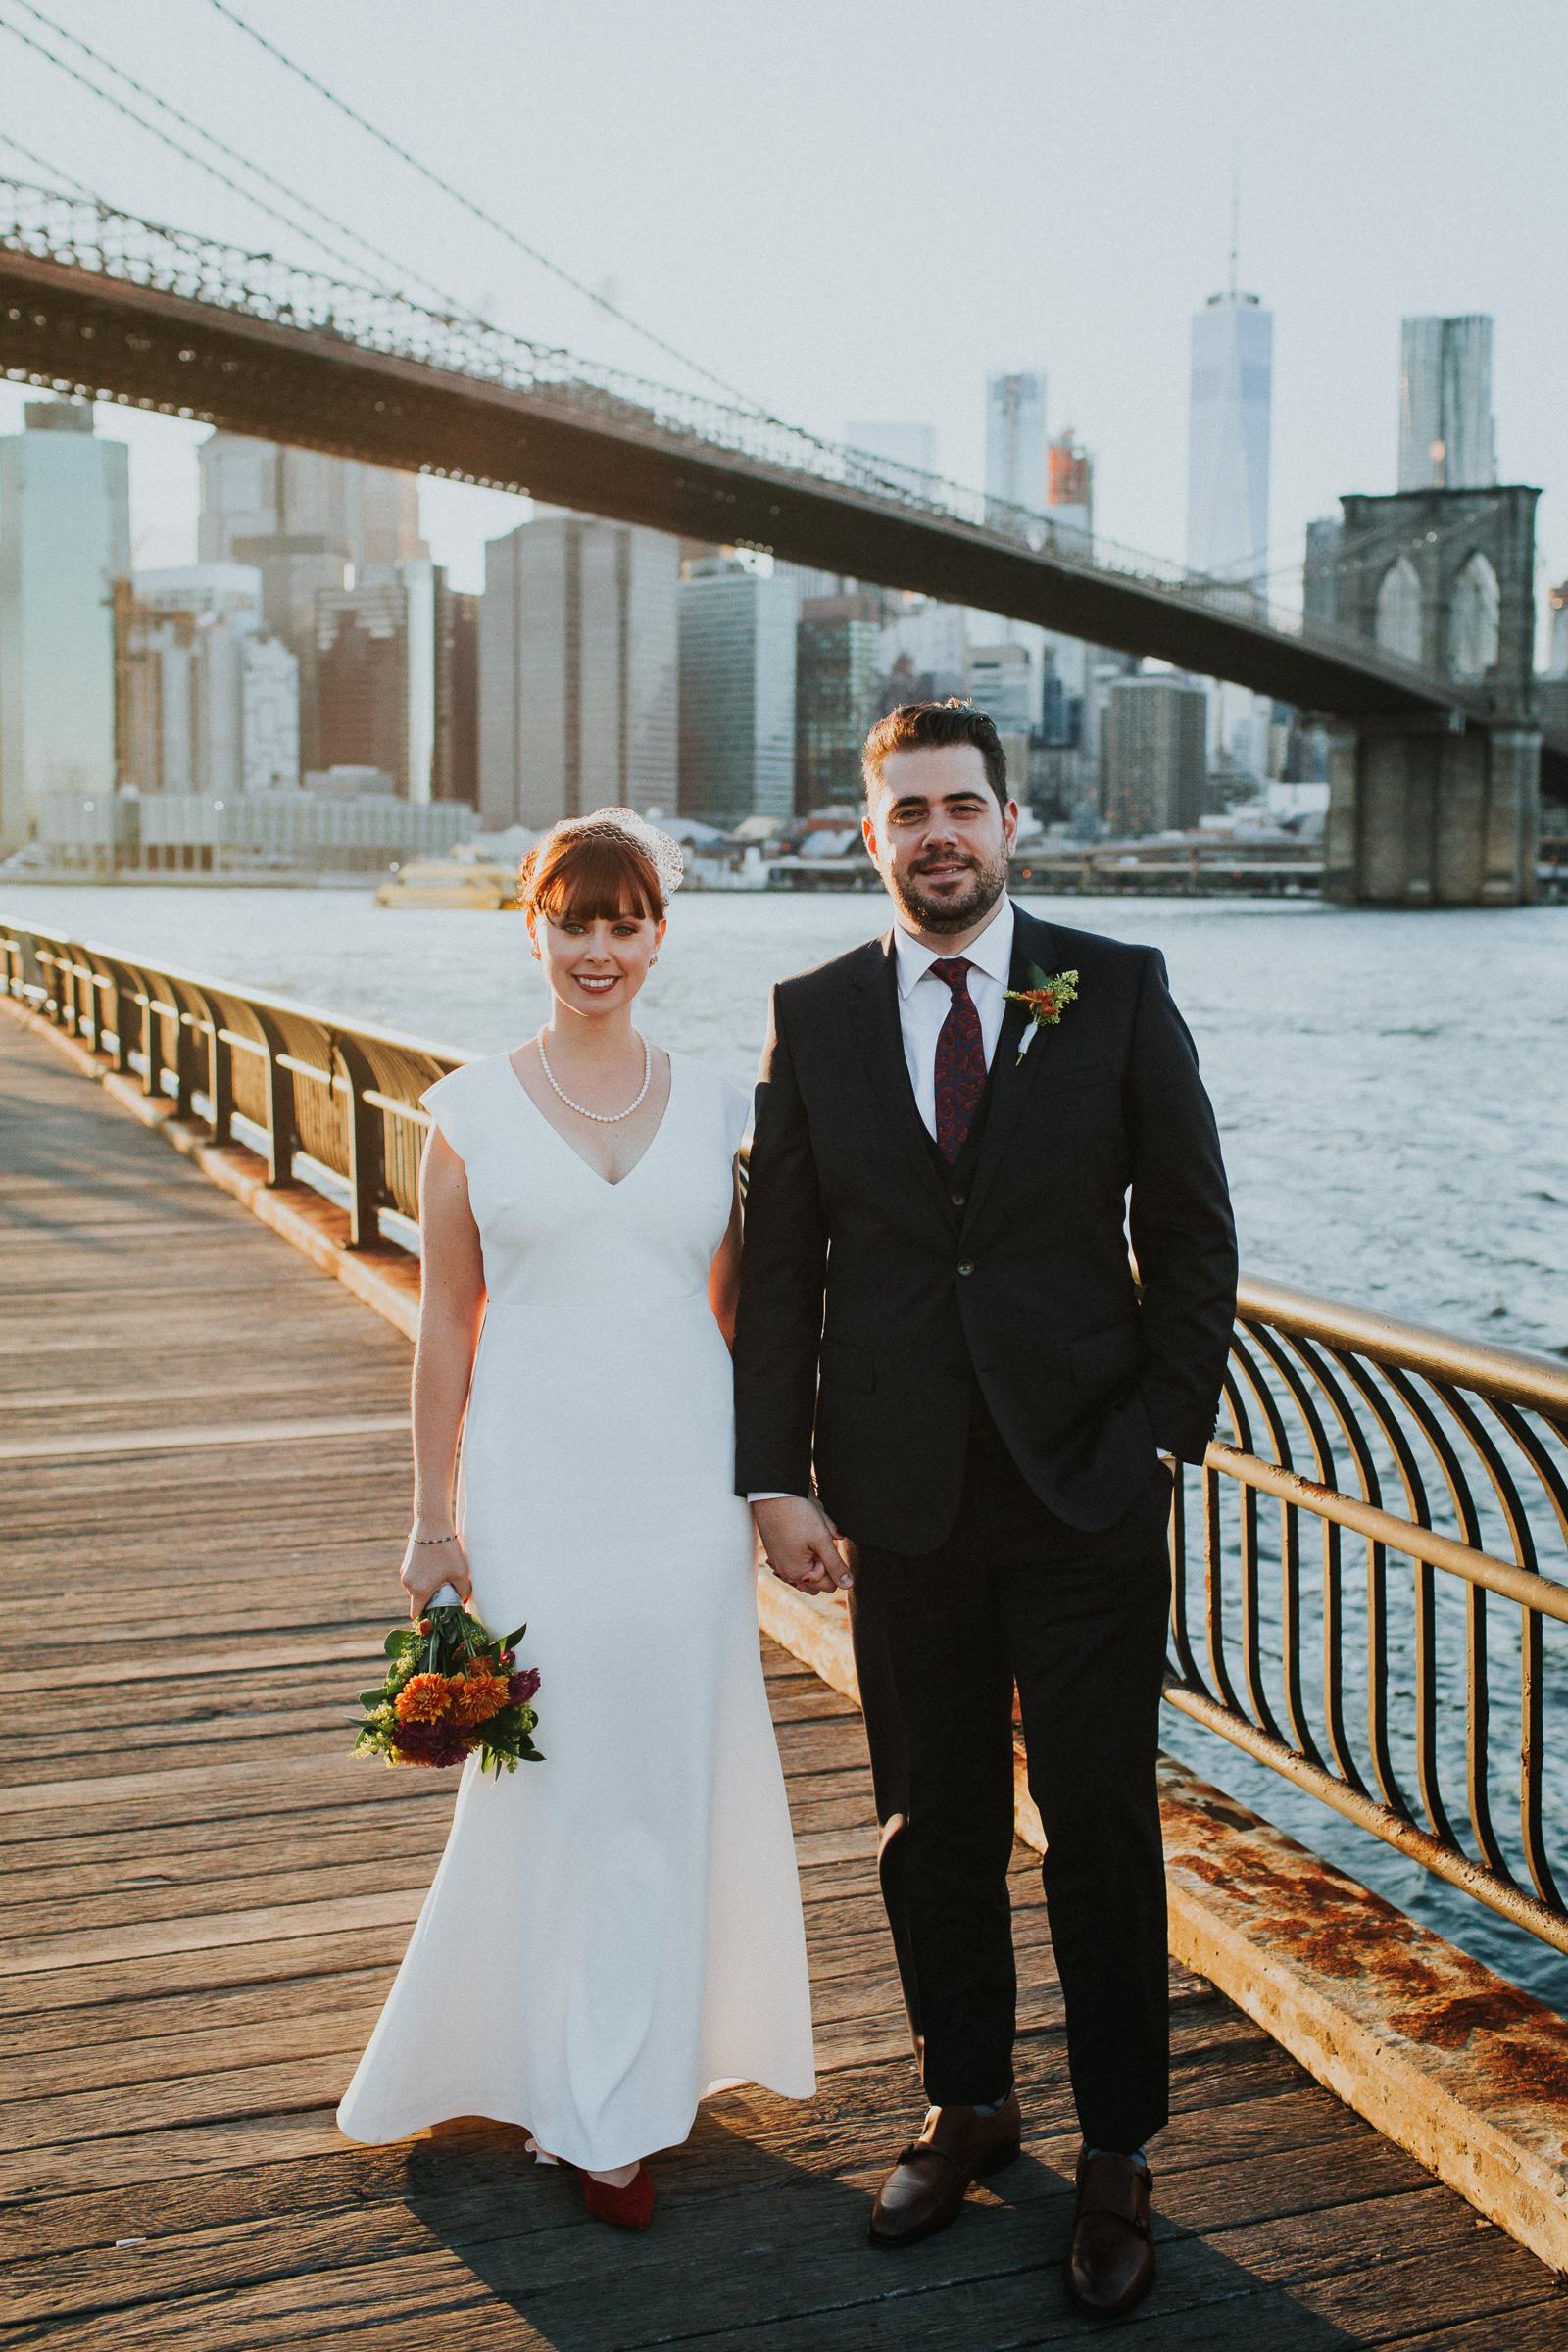 Dumbo-Brooklyn-Bridge-Park-NYC-Elopement-Documentary-Photographer-34.jpg